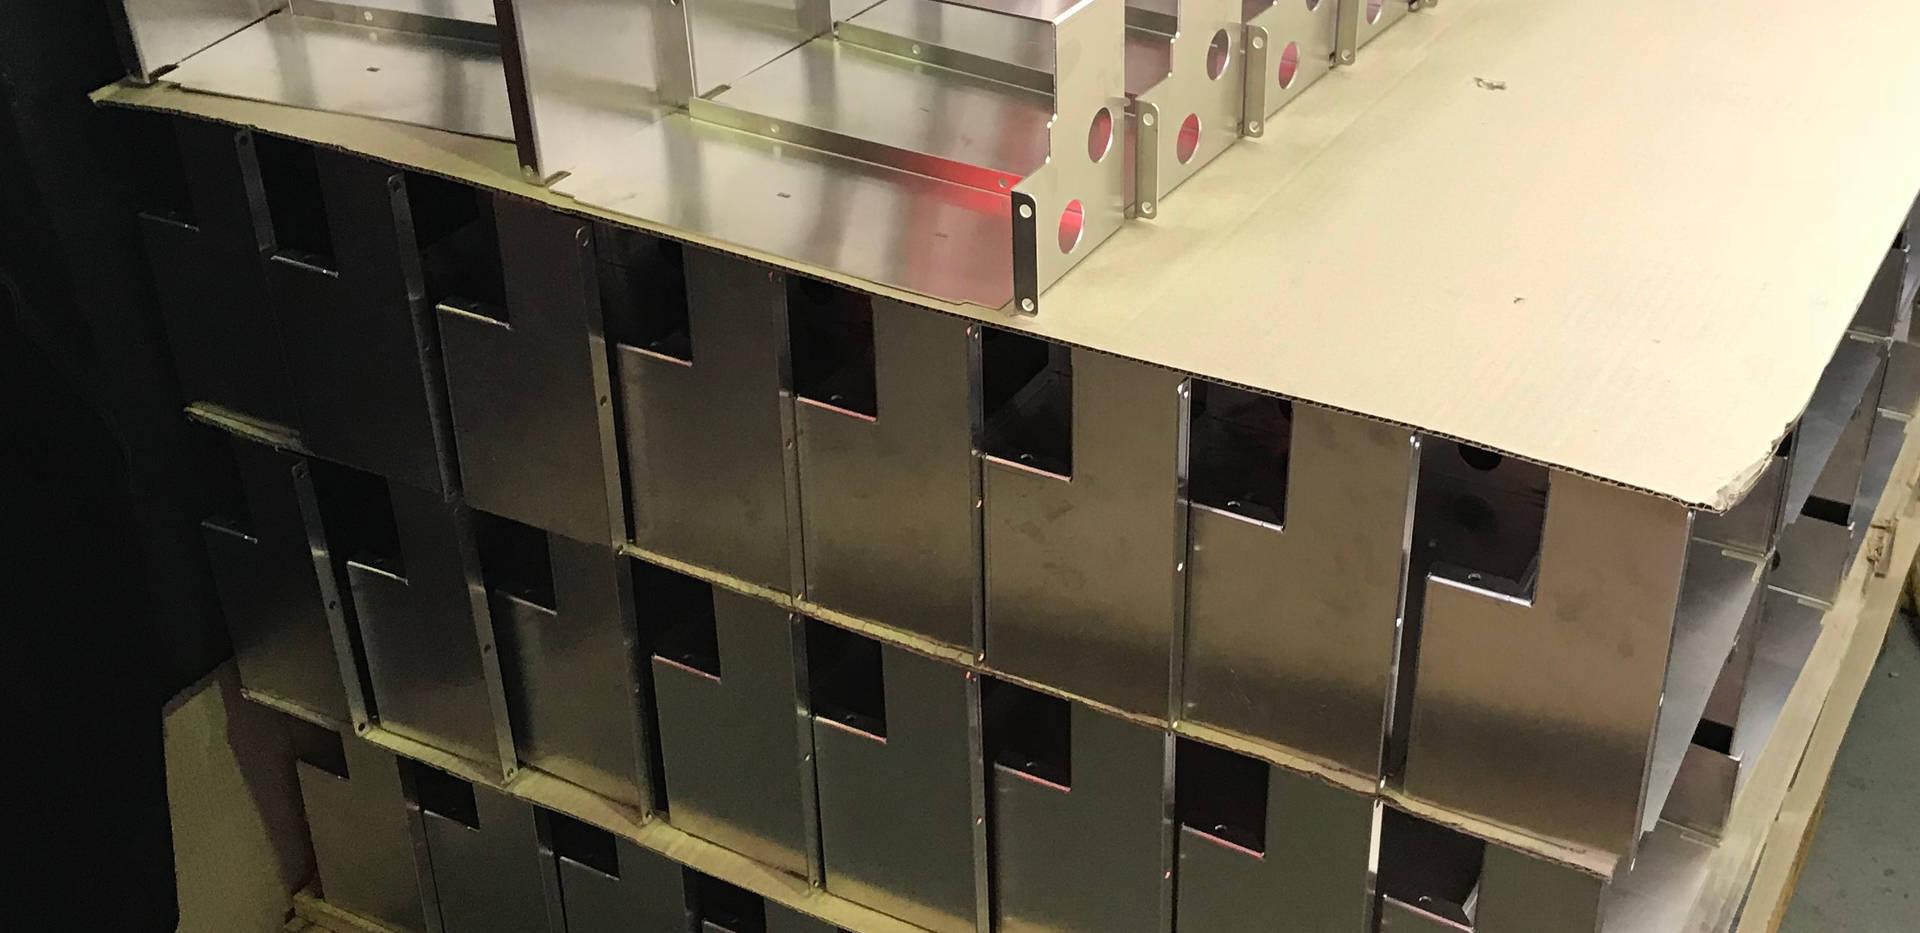 Aluminium Sheetmetal Laser Cut, Bend and Ready for Welding